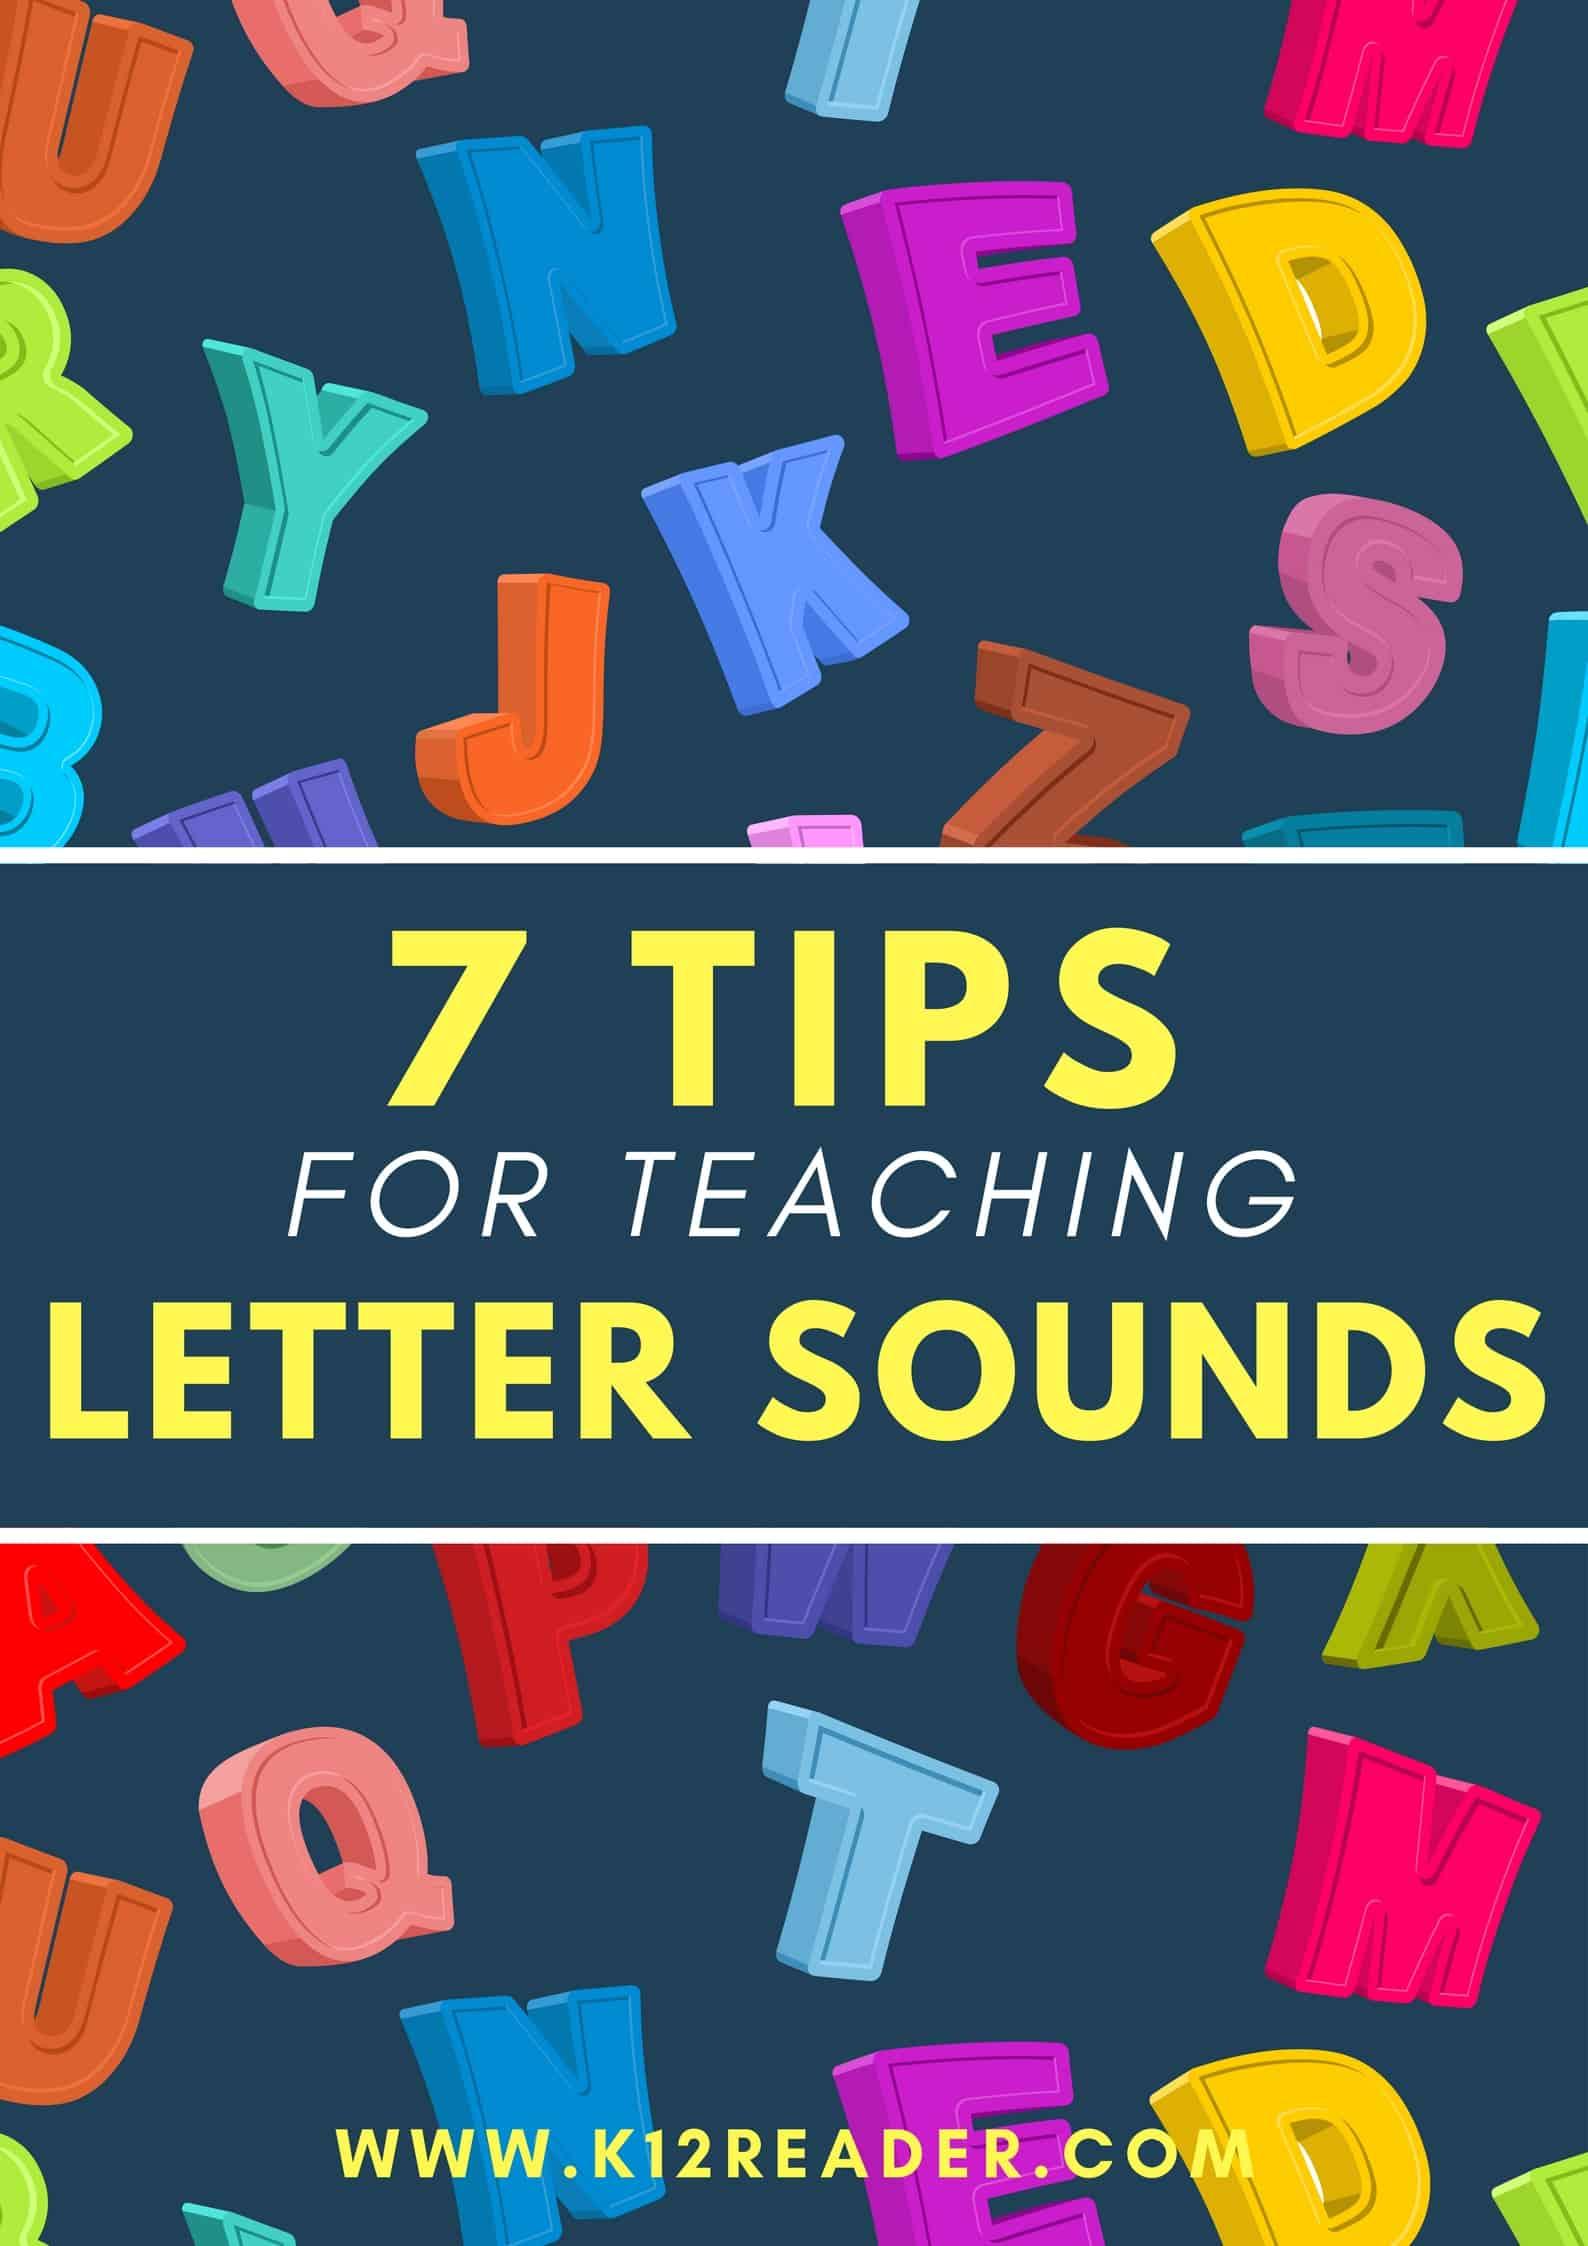 7 Tips For Teaching Letter Sounds